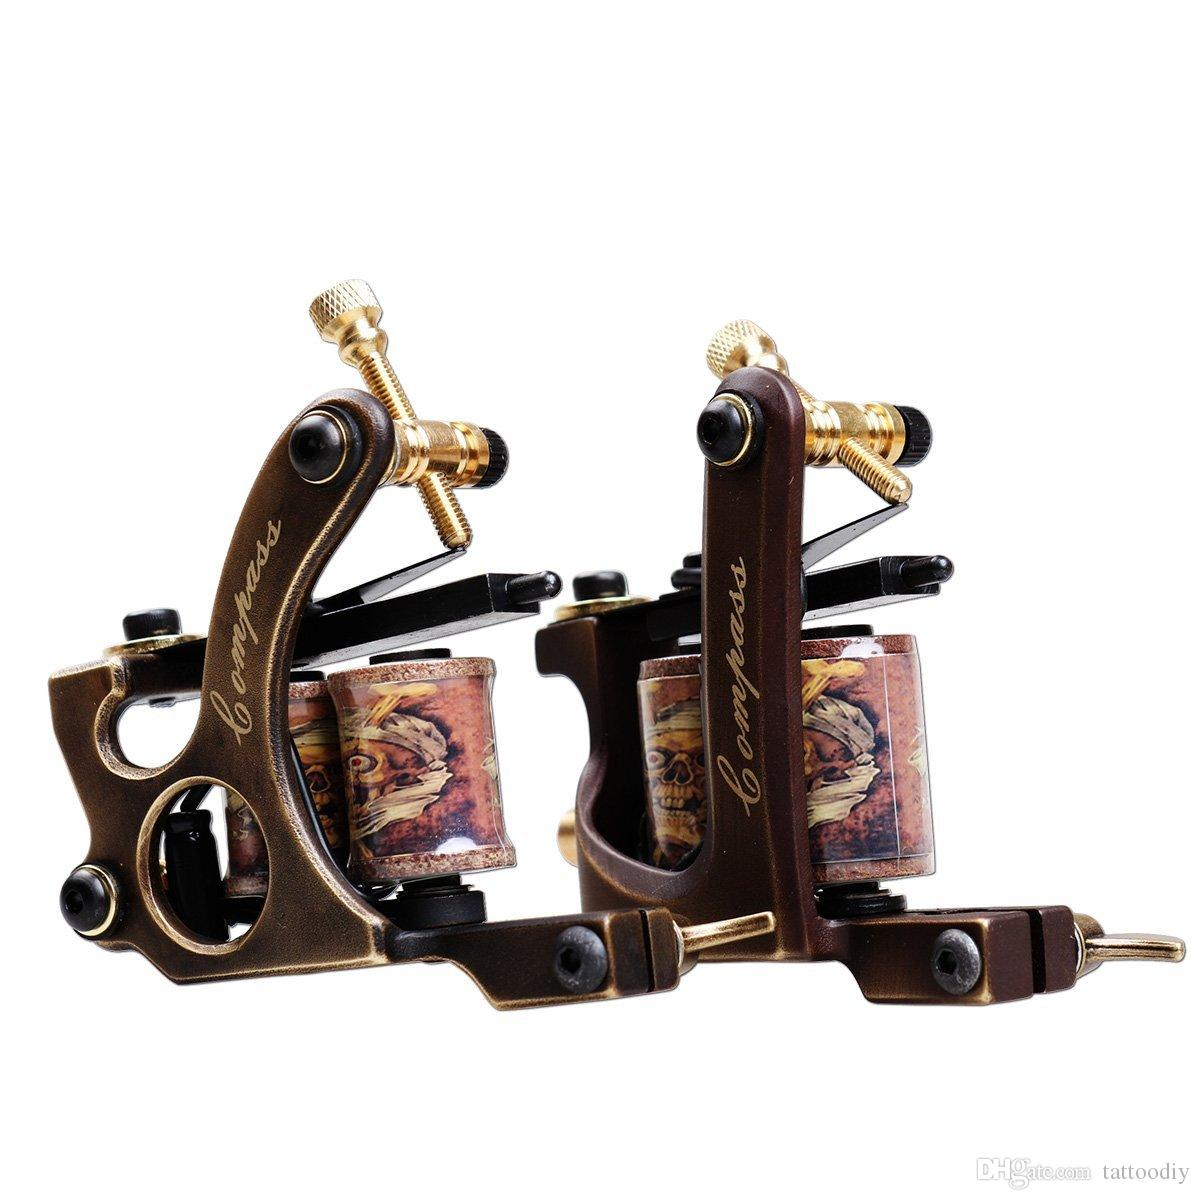 A pair of Liner and Shader Tattoo Machines Copper Frame Handmade Tattoo Gun Professional Tattoo Supplies